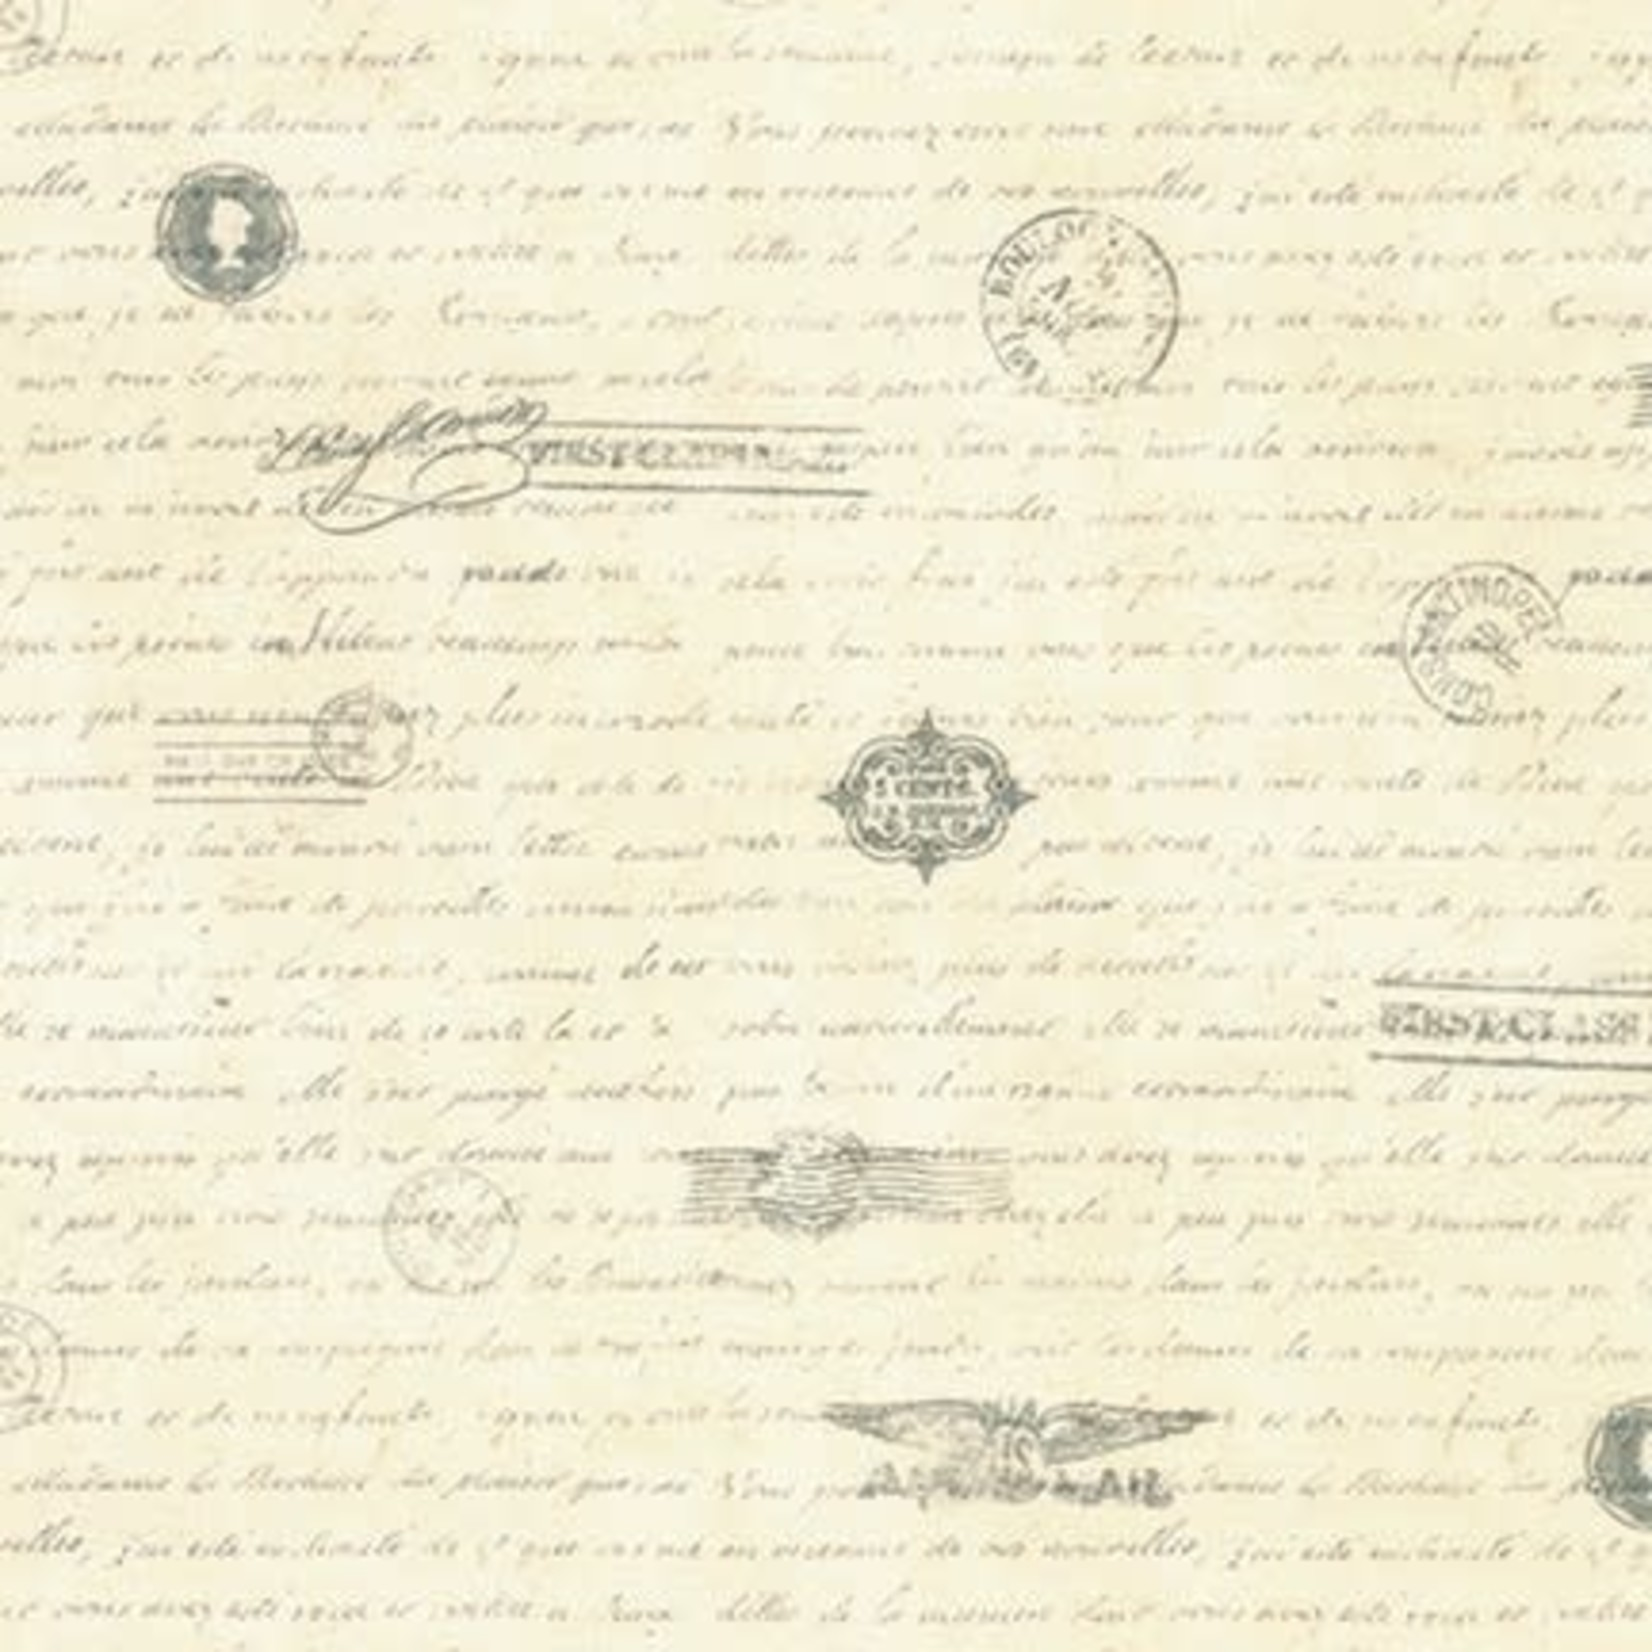 ROBERT KAUFMAN Library of Rarities, Air Mail, Vintage Natural, per cm or $20/m